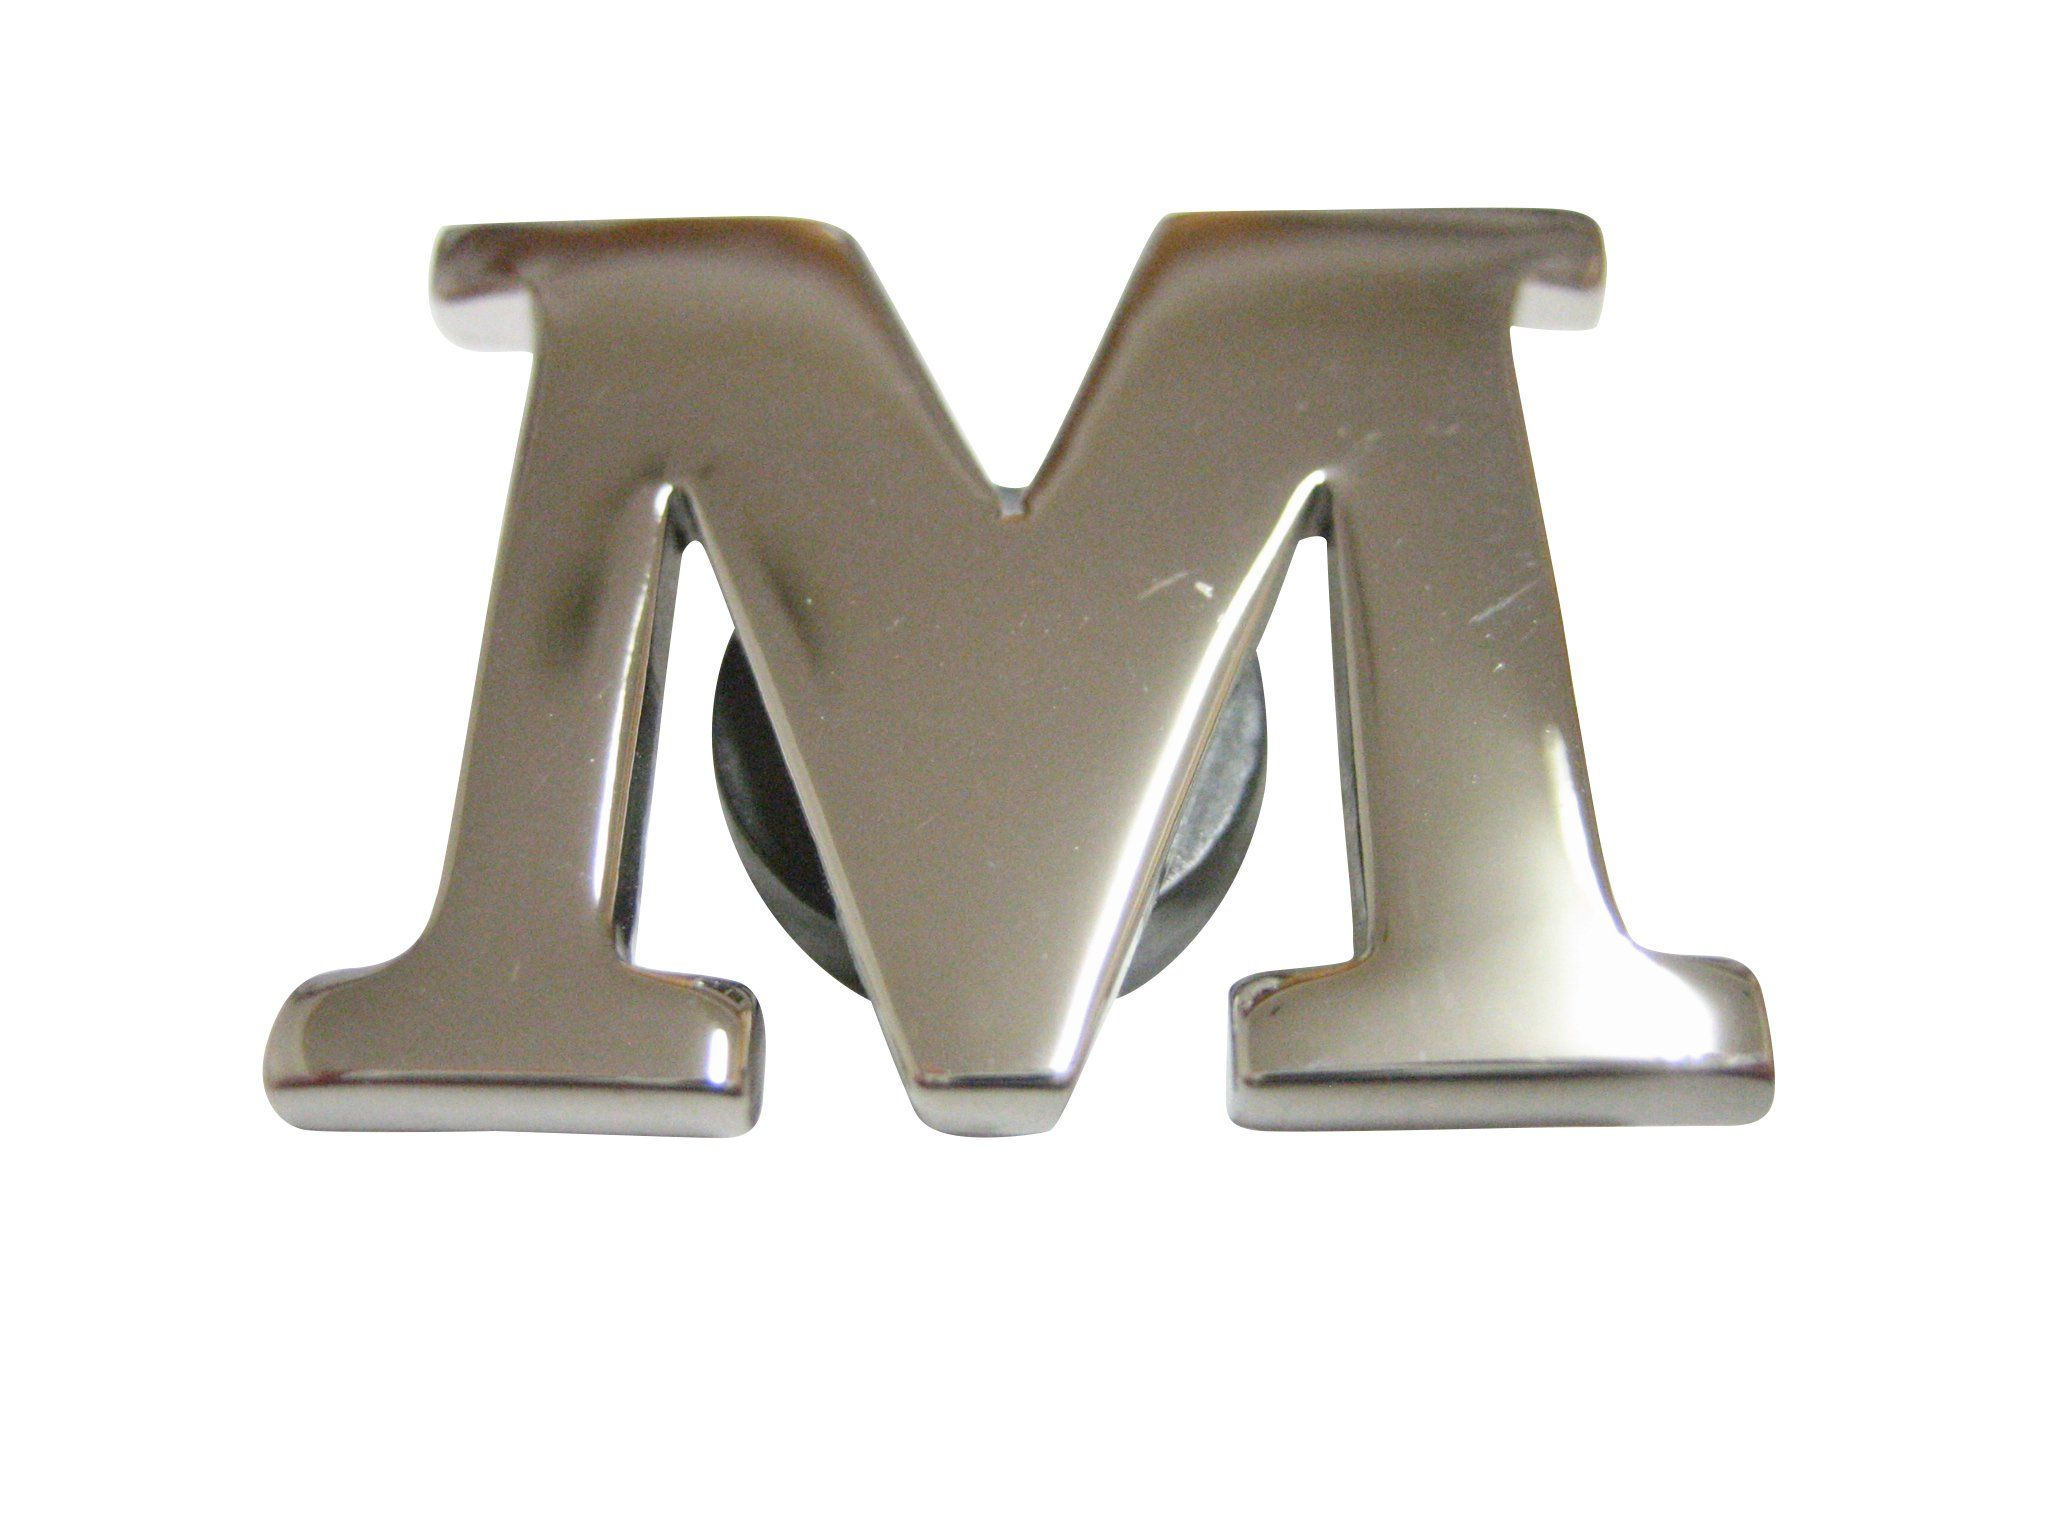 Gold Toned Etched Oval Letter F Monogram Magnet